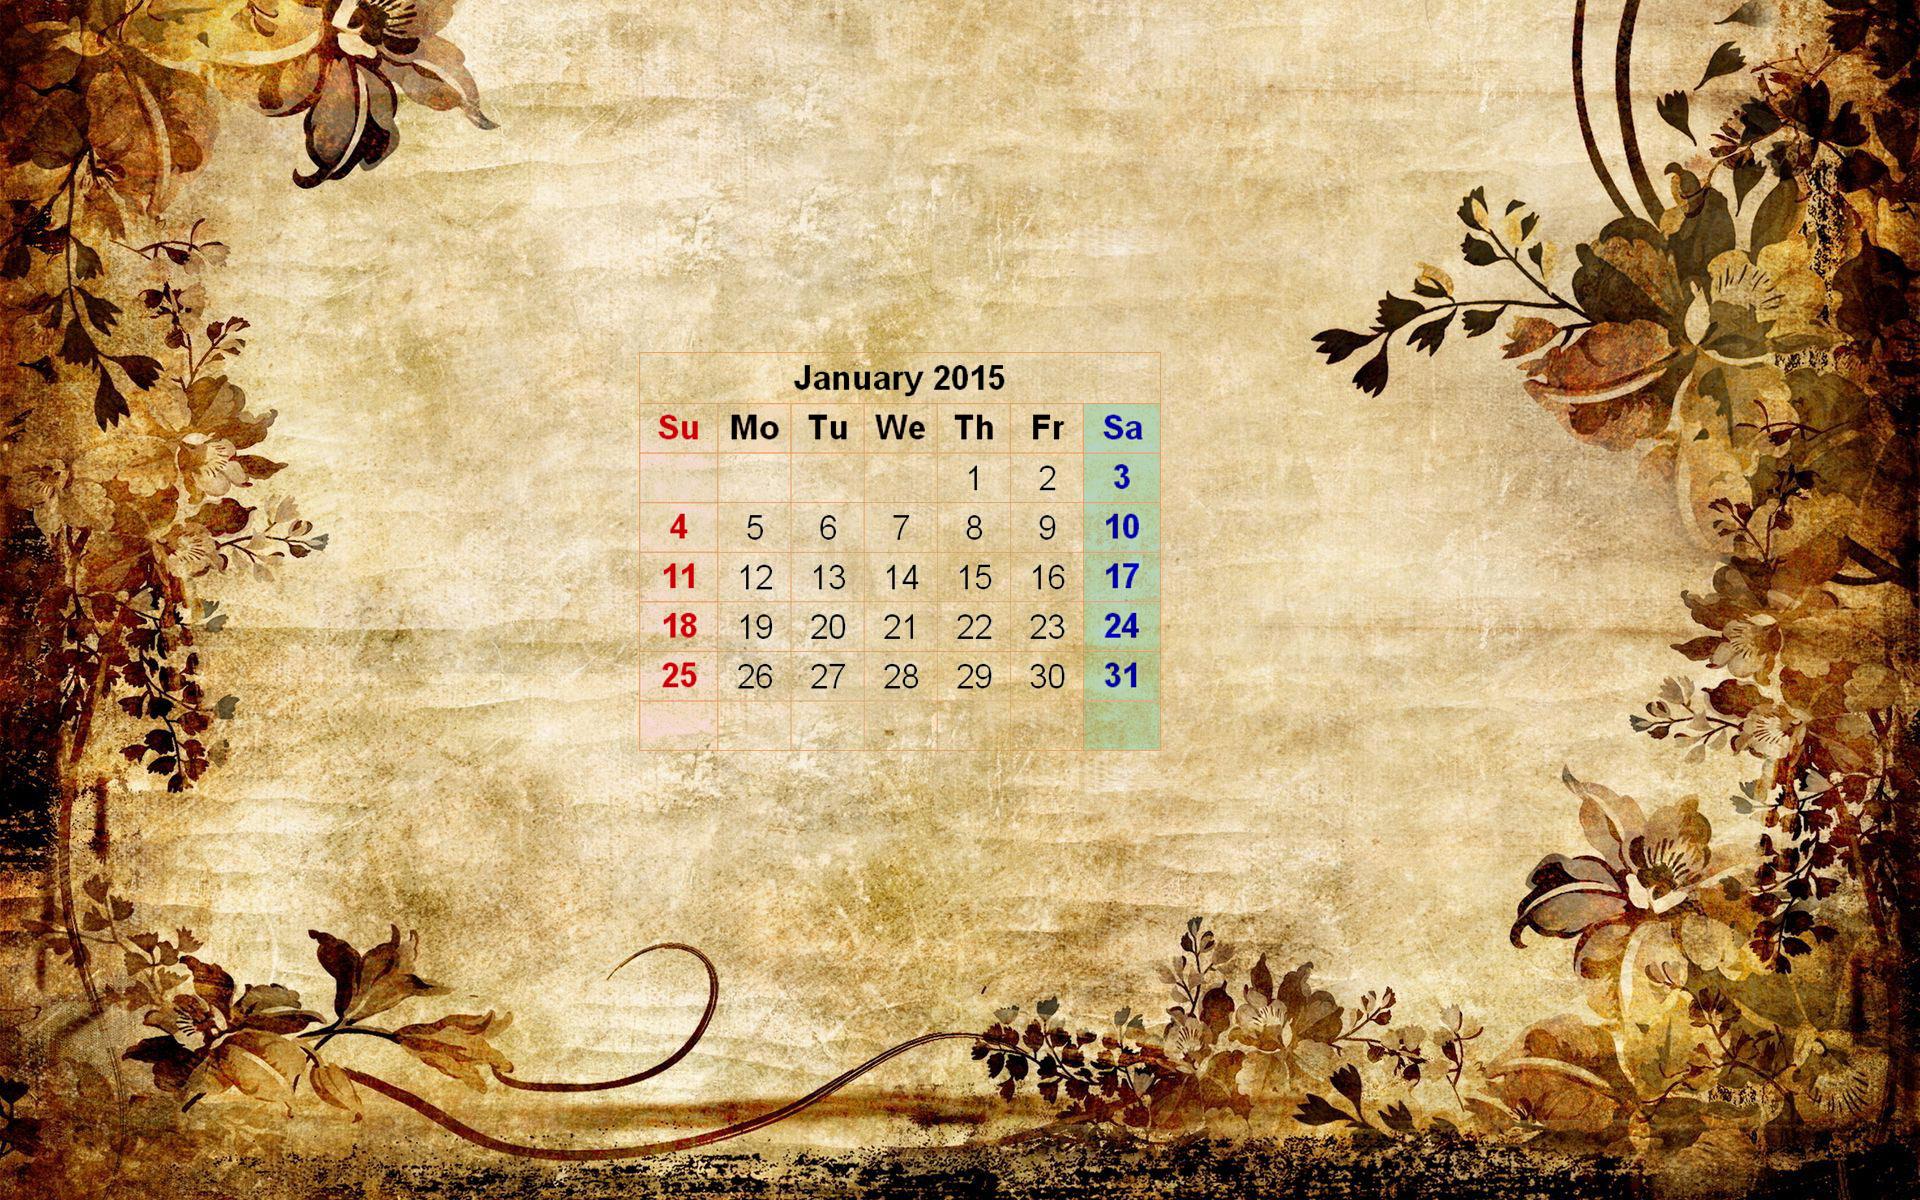 January 2015 Calendar Wallpaper Happy Holidays 2014 1920x1200